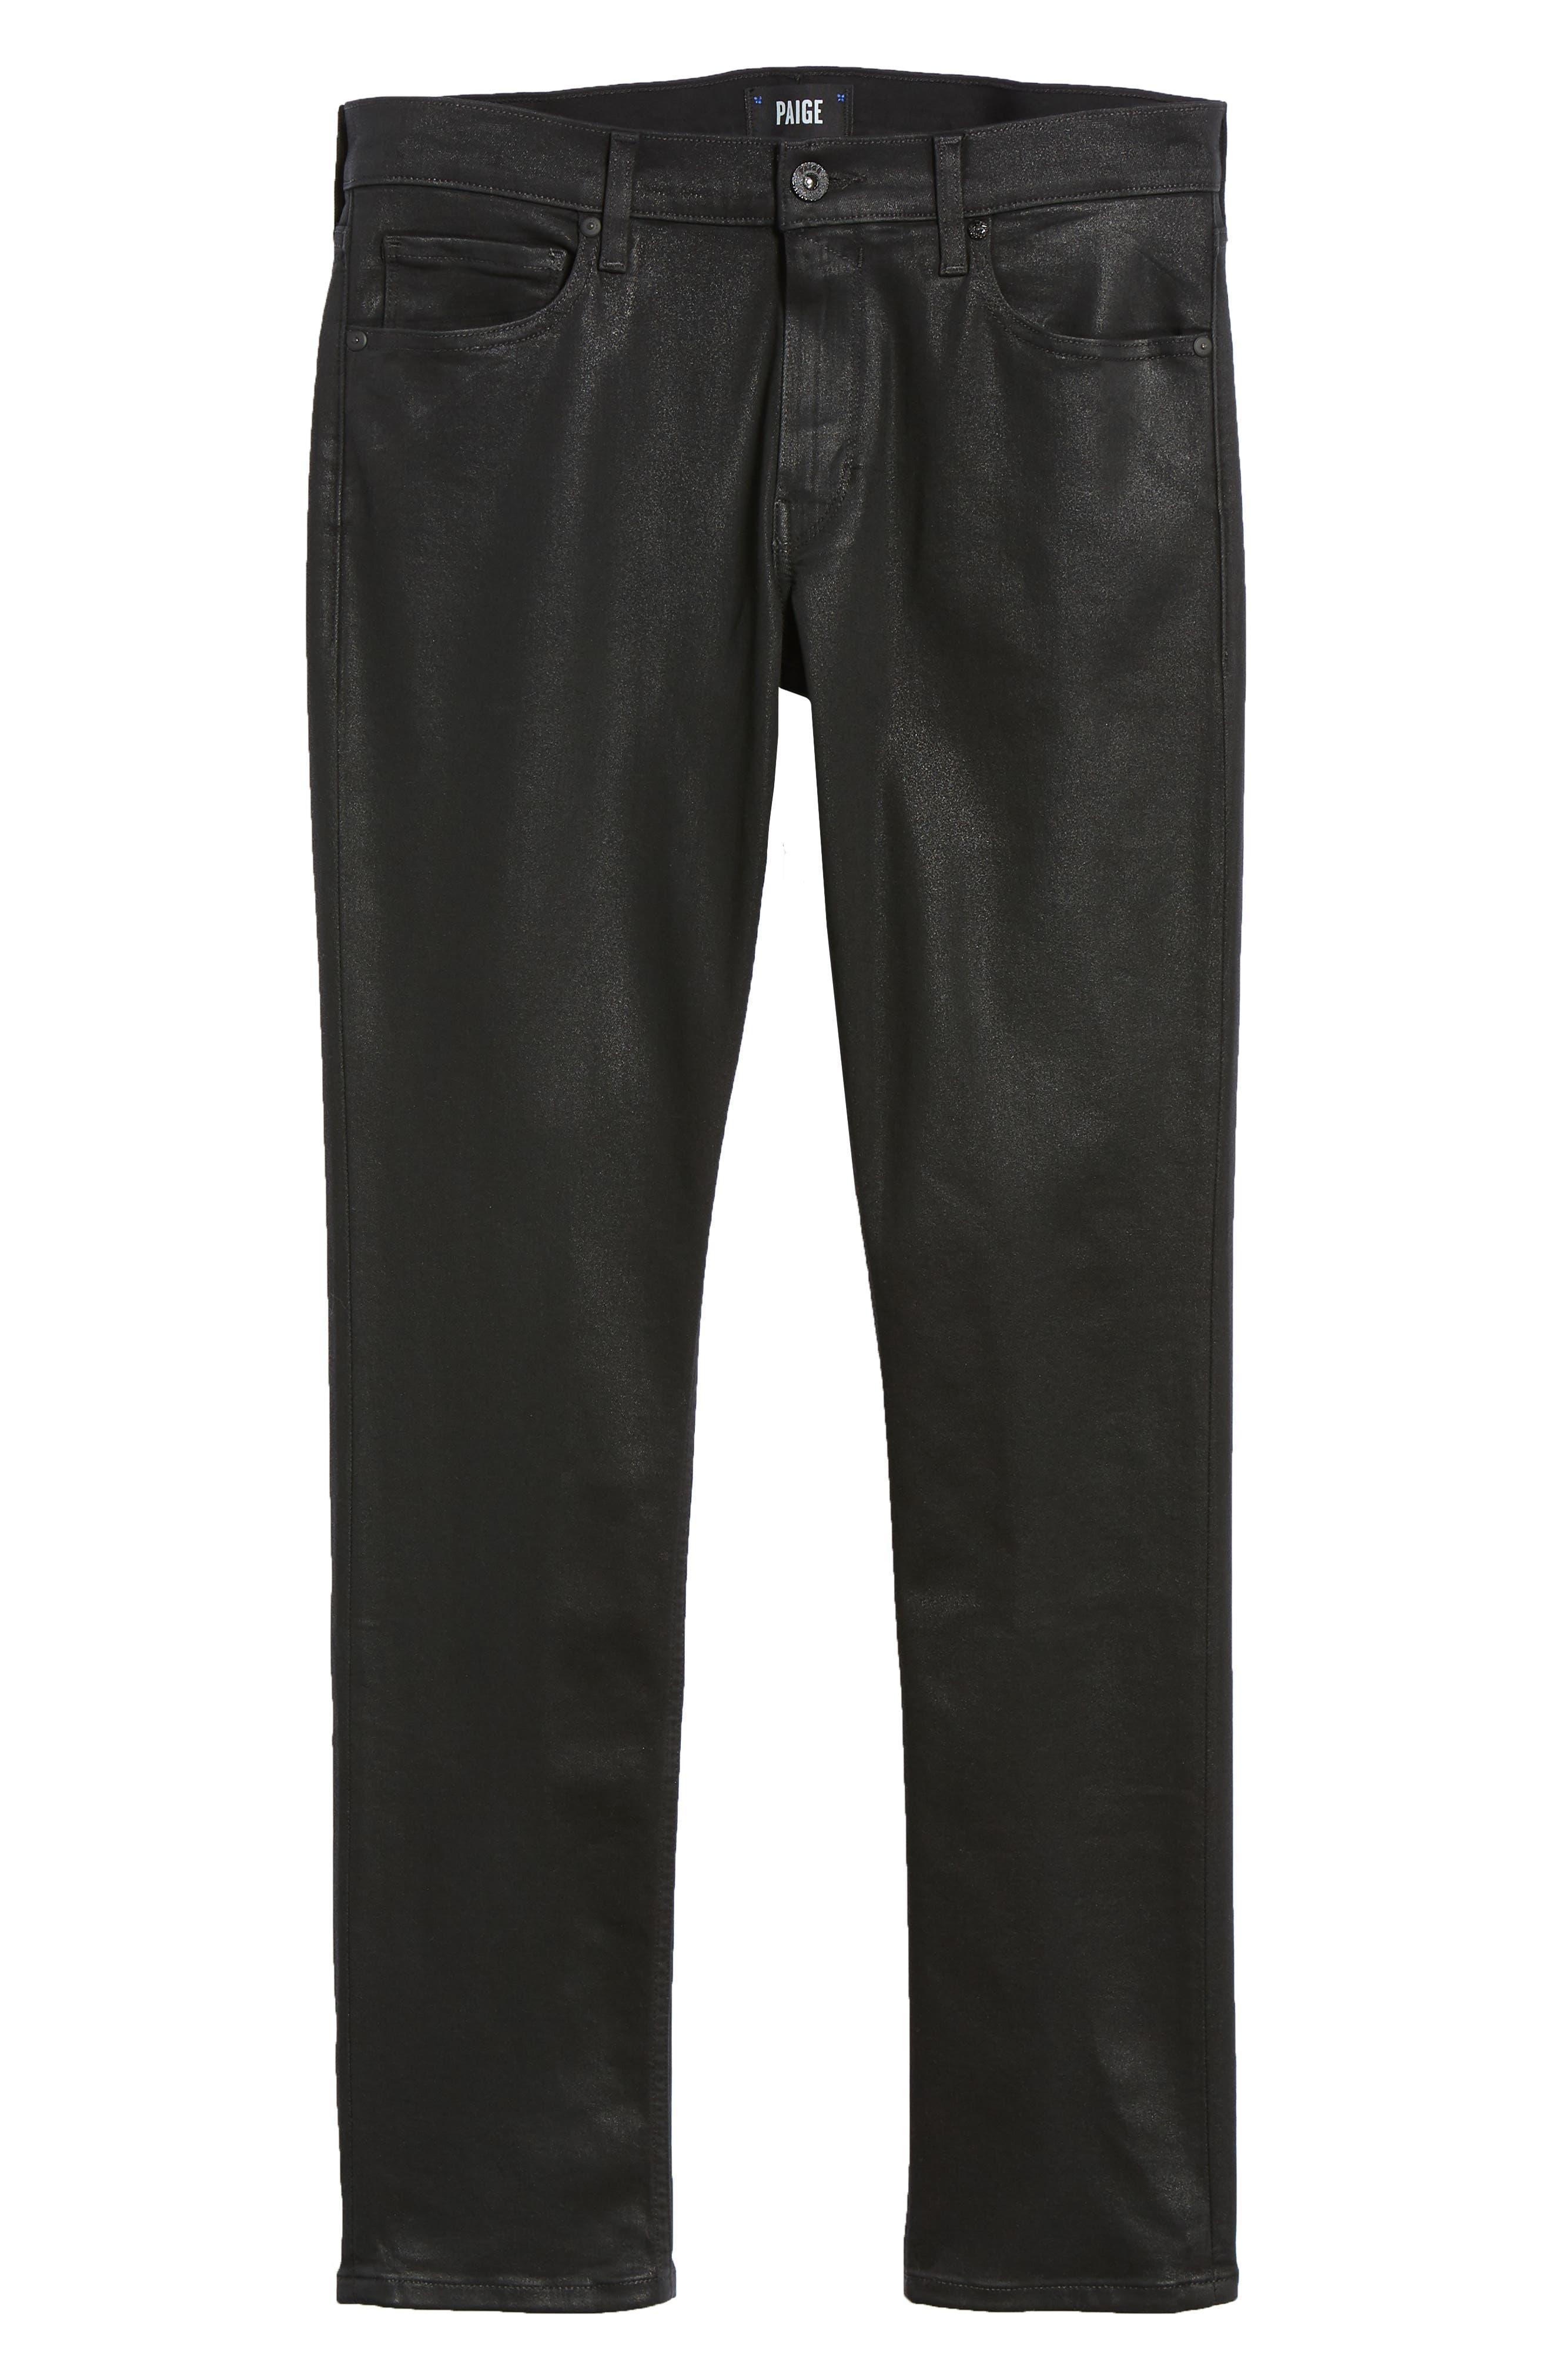 Transcend - Lennox Slim Fit Jeans,                             Alternate thumbnail 6, color,                             WILKS COATED